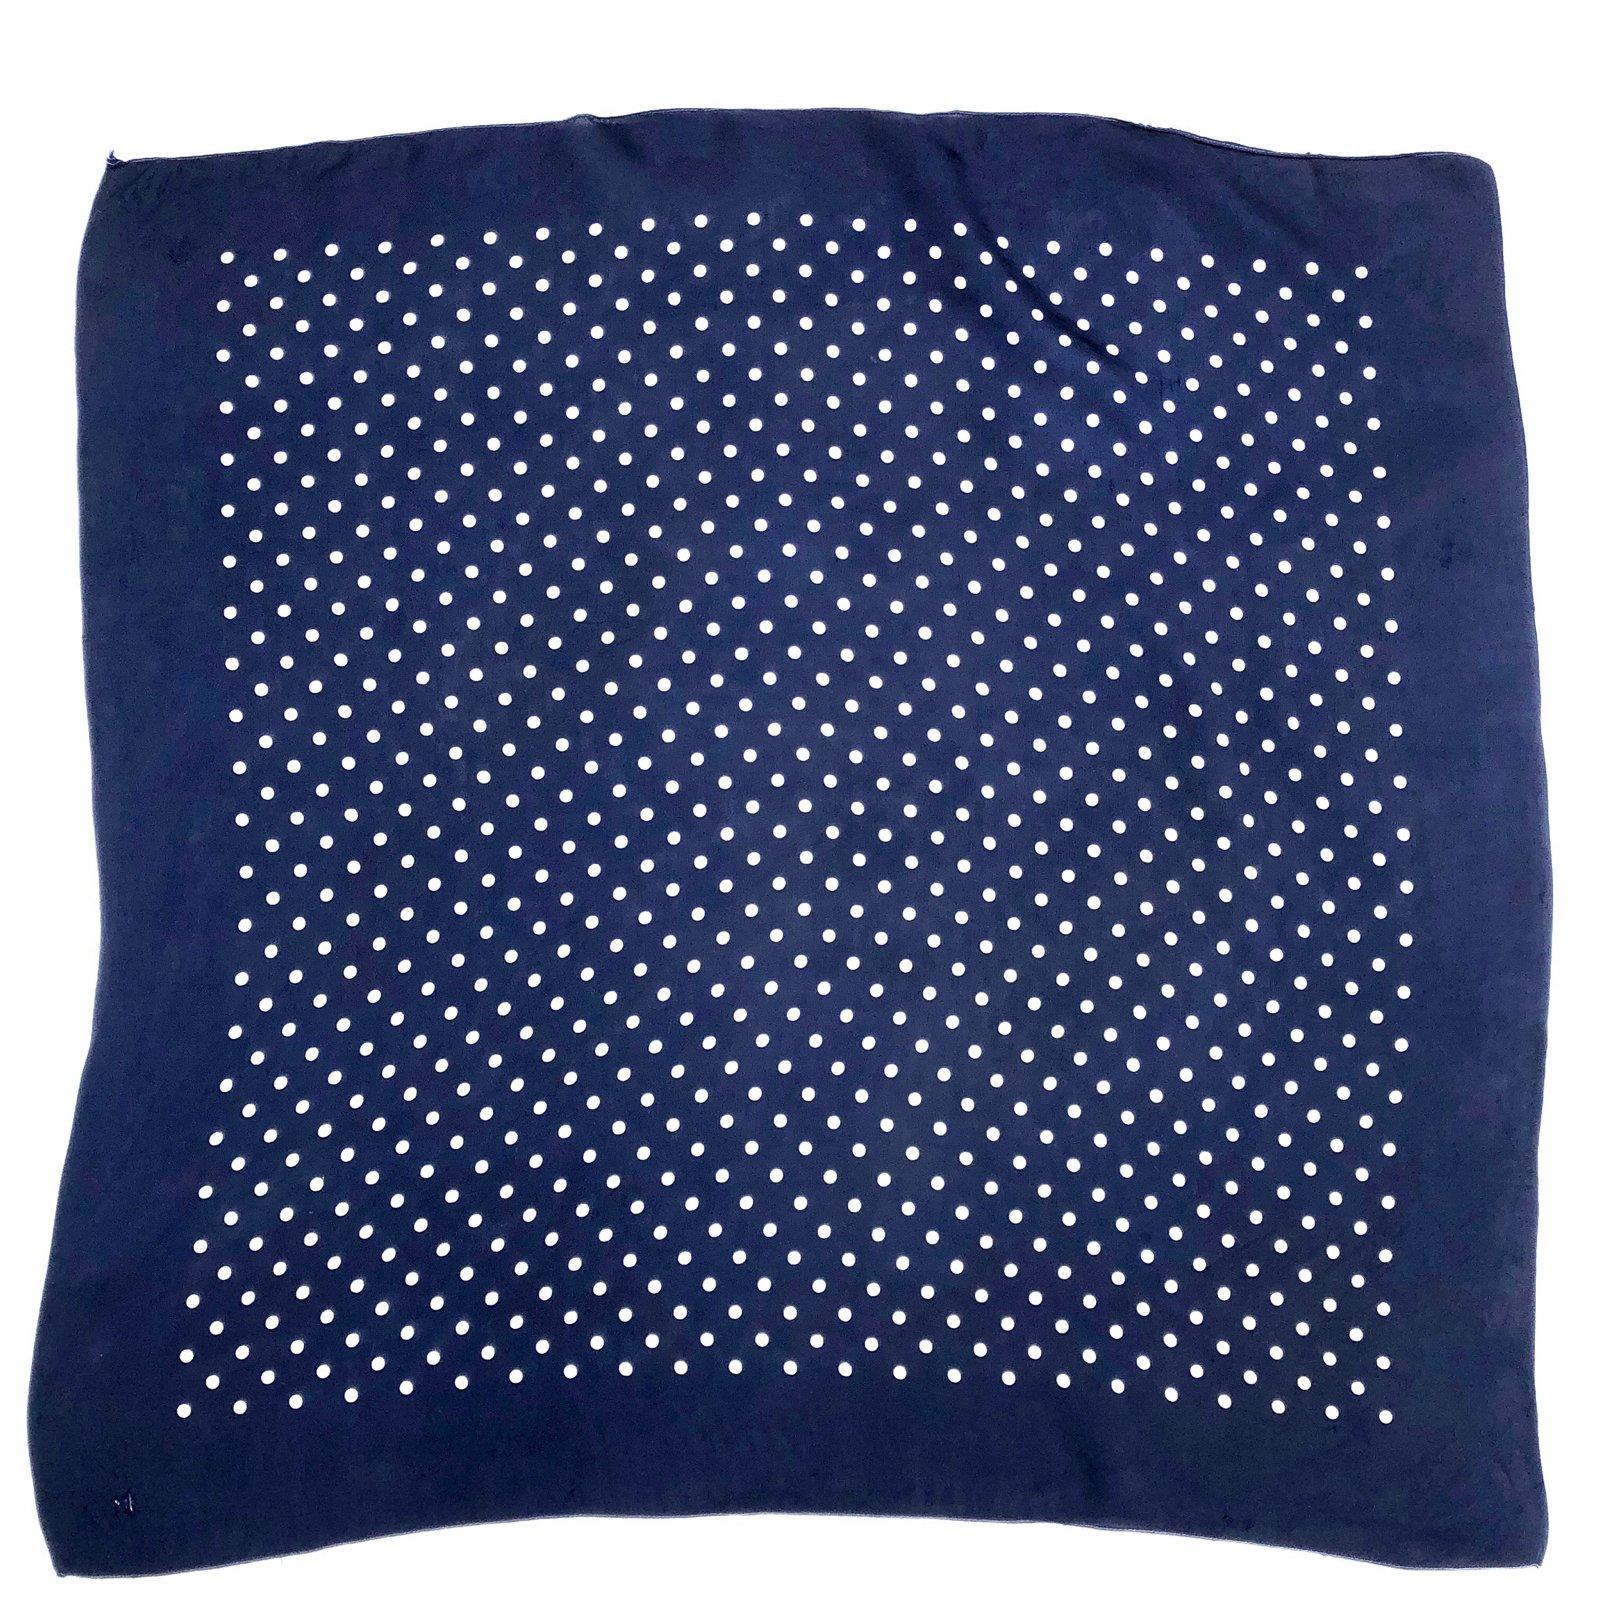 Image of 60's Polka Dots Silk scarf